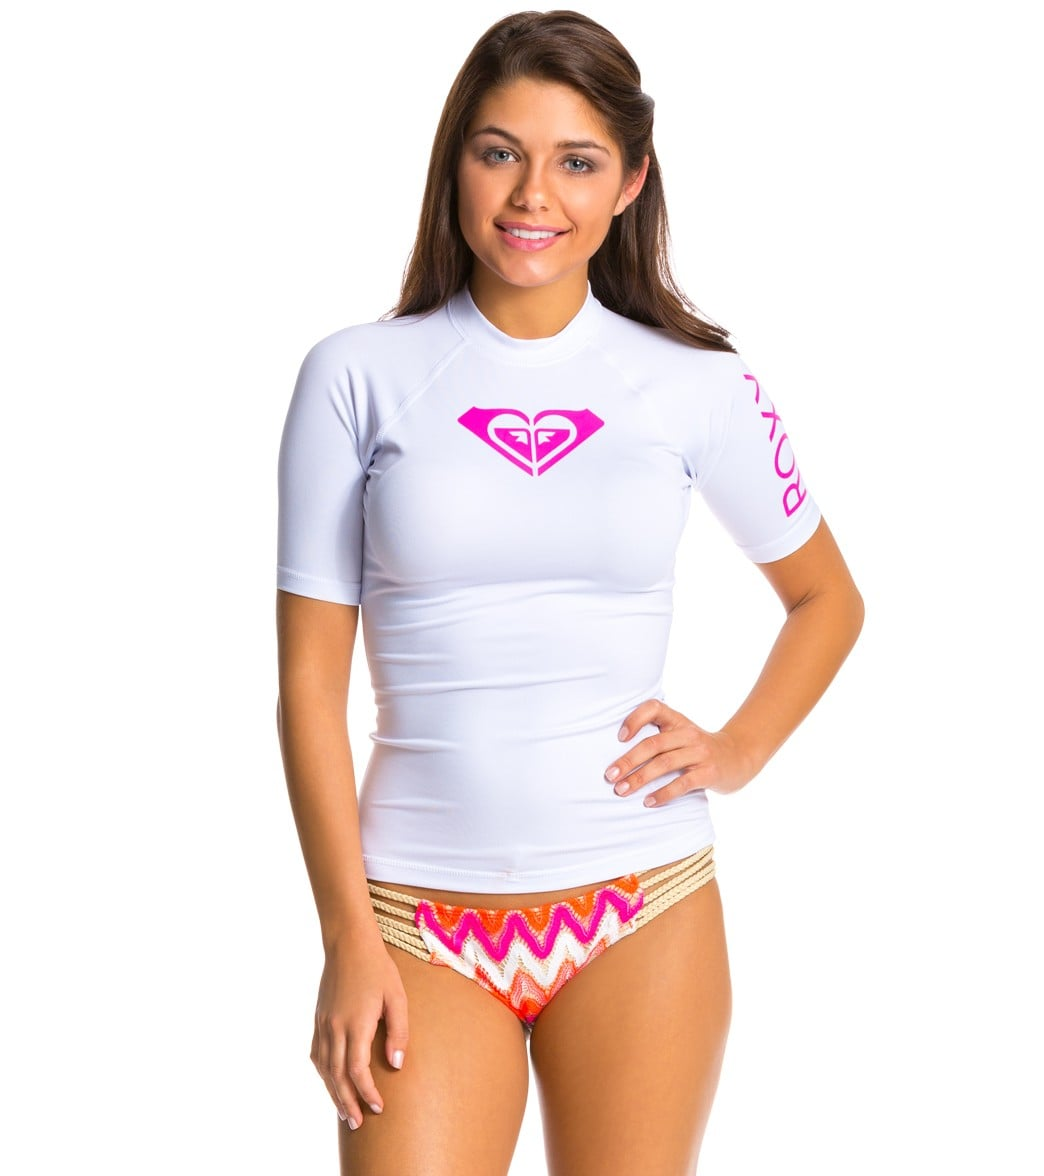 f21ac13c18 Roxy Women's Whole Hearted Short Sleeve Rashguard at SwimOutlet.com